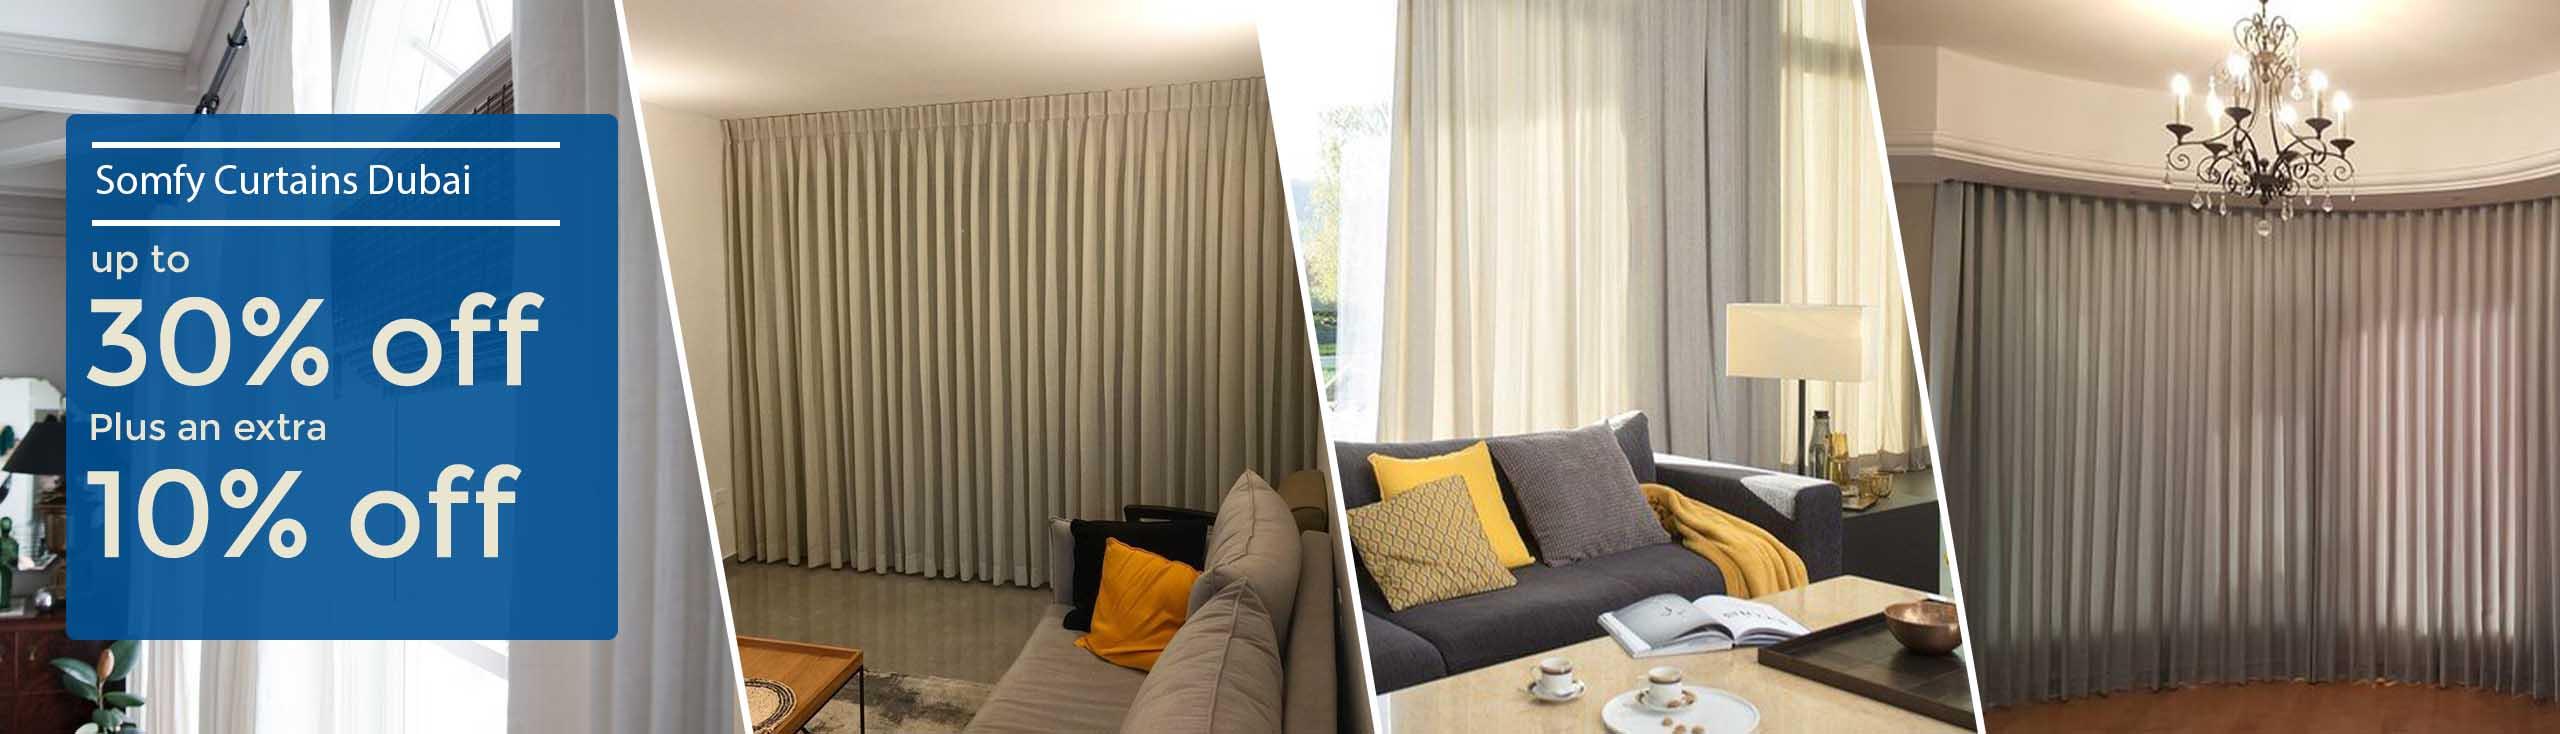 Somfy Curtains Dubai